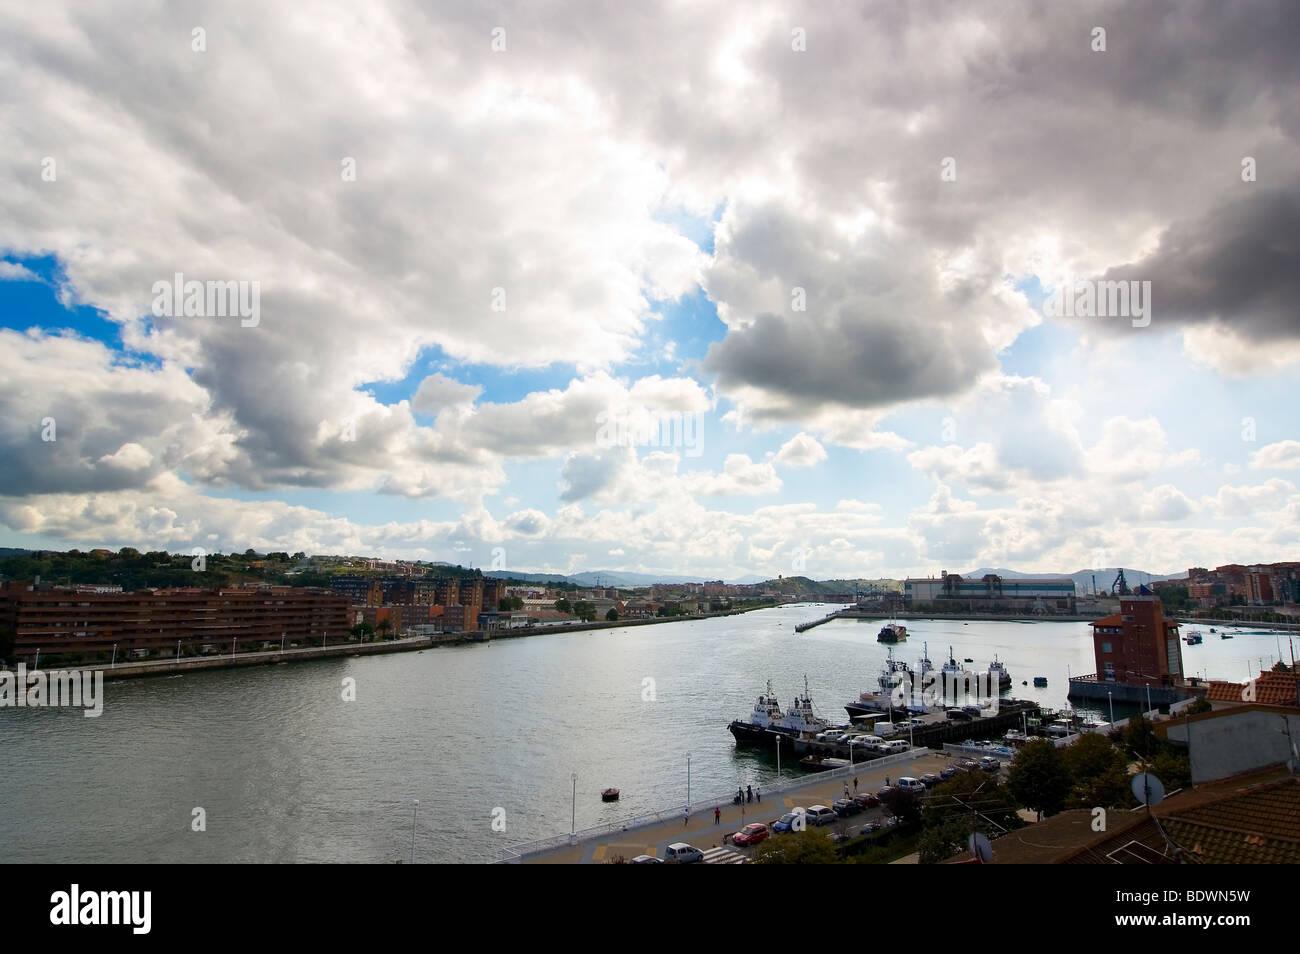 Sky of Bilbao - Stock Image